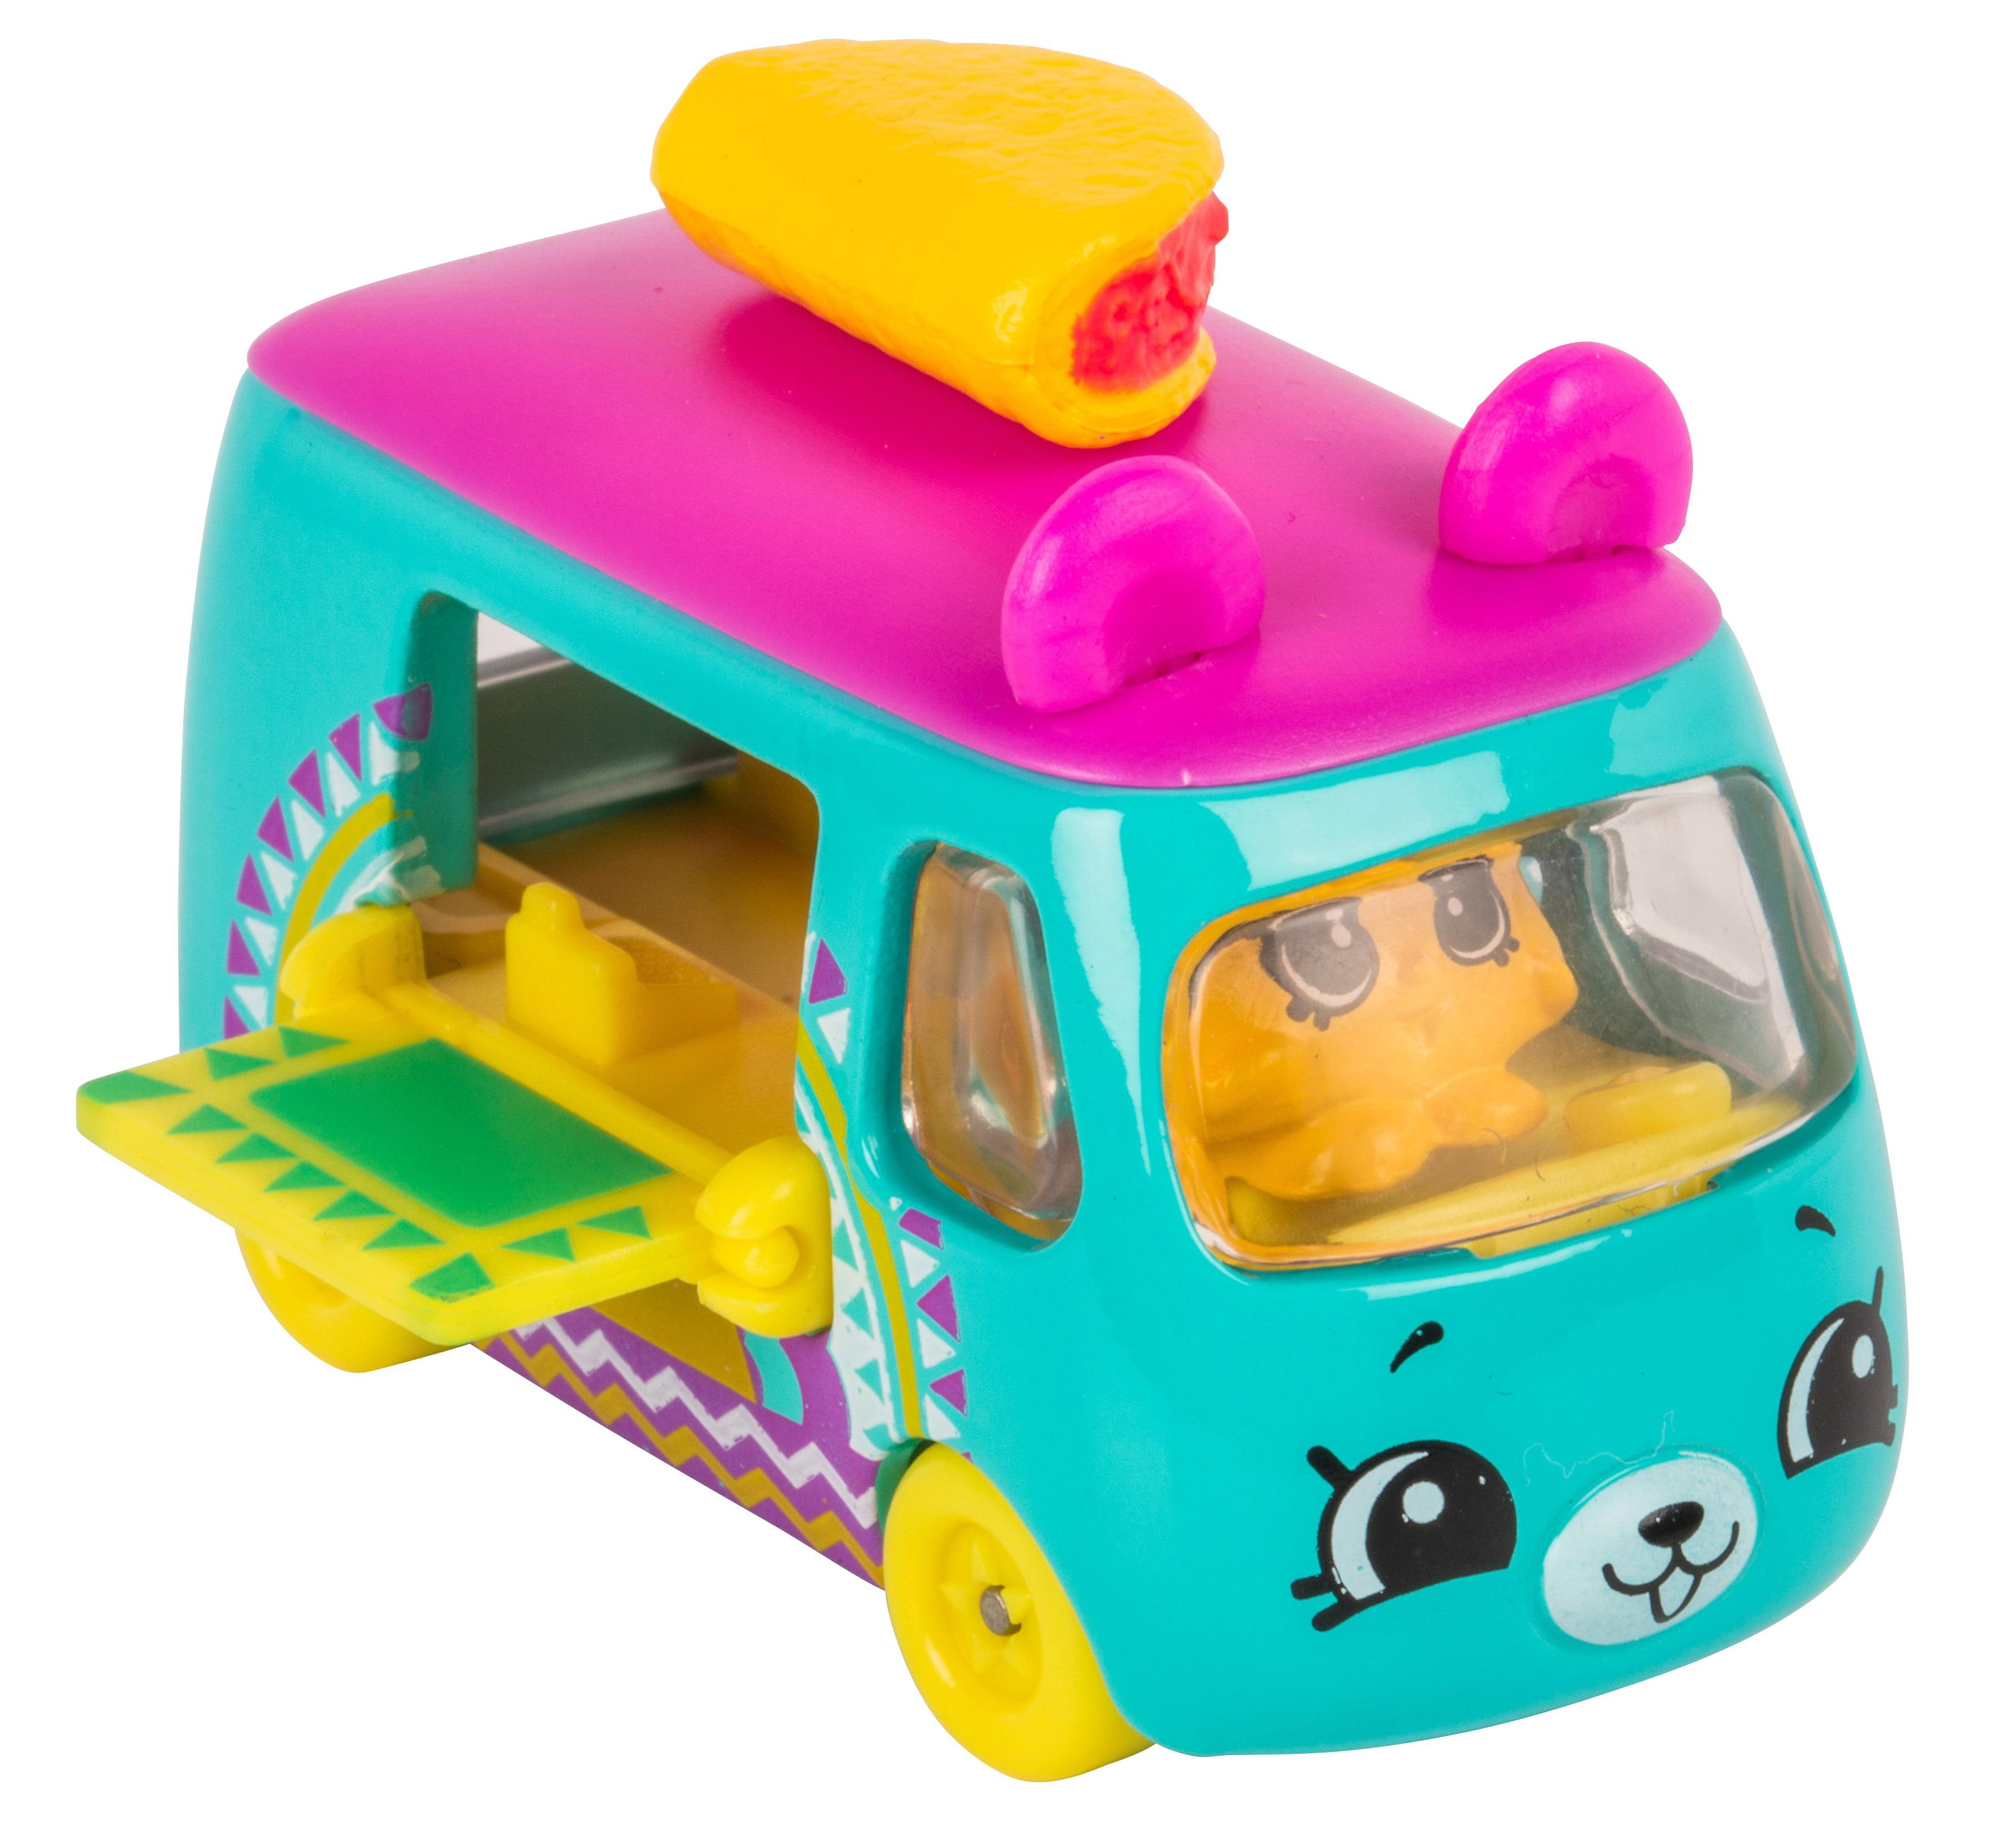 Shopkins Cutie Car Single Pack, TRAVELING TACO